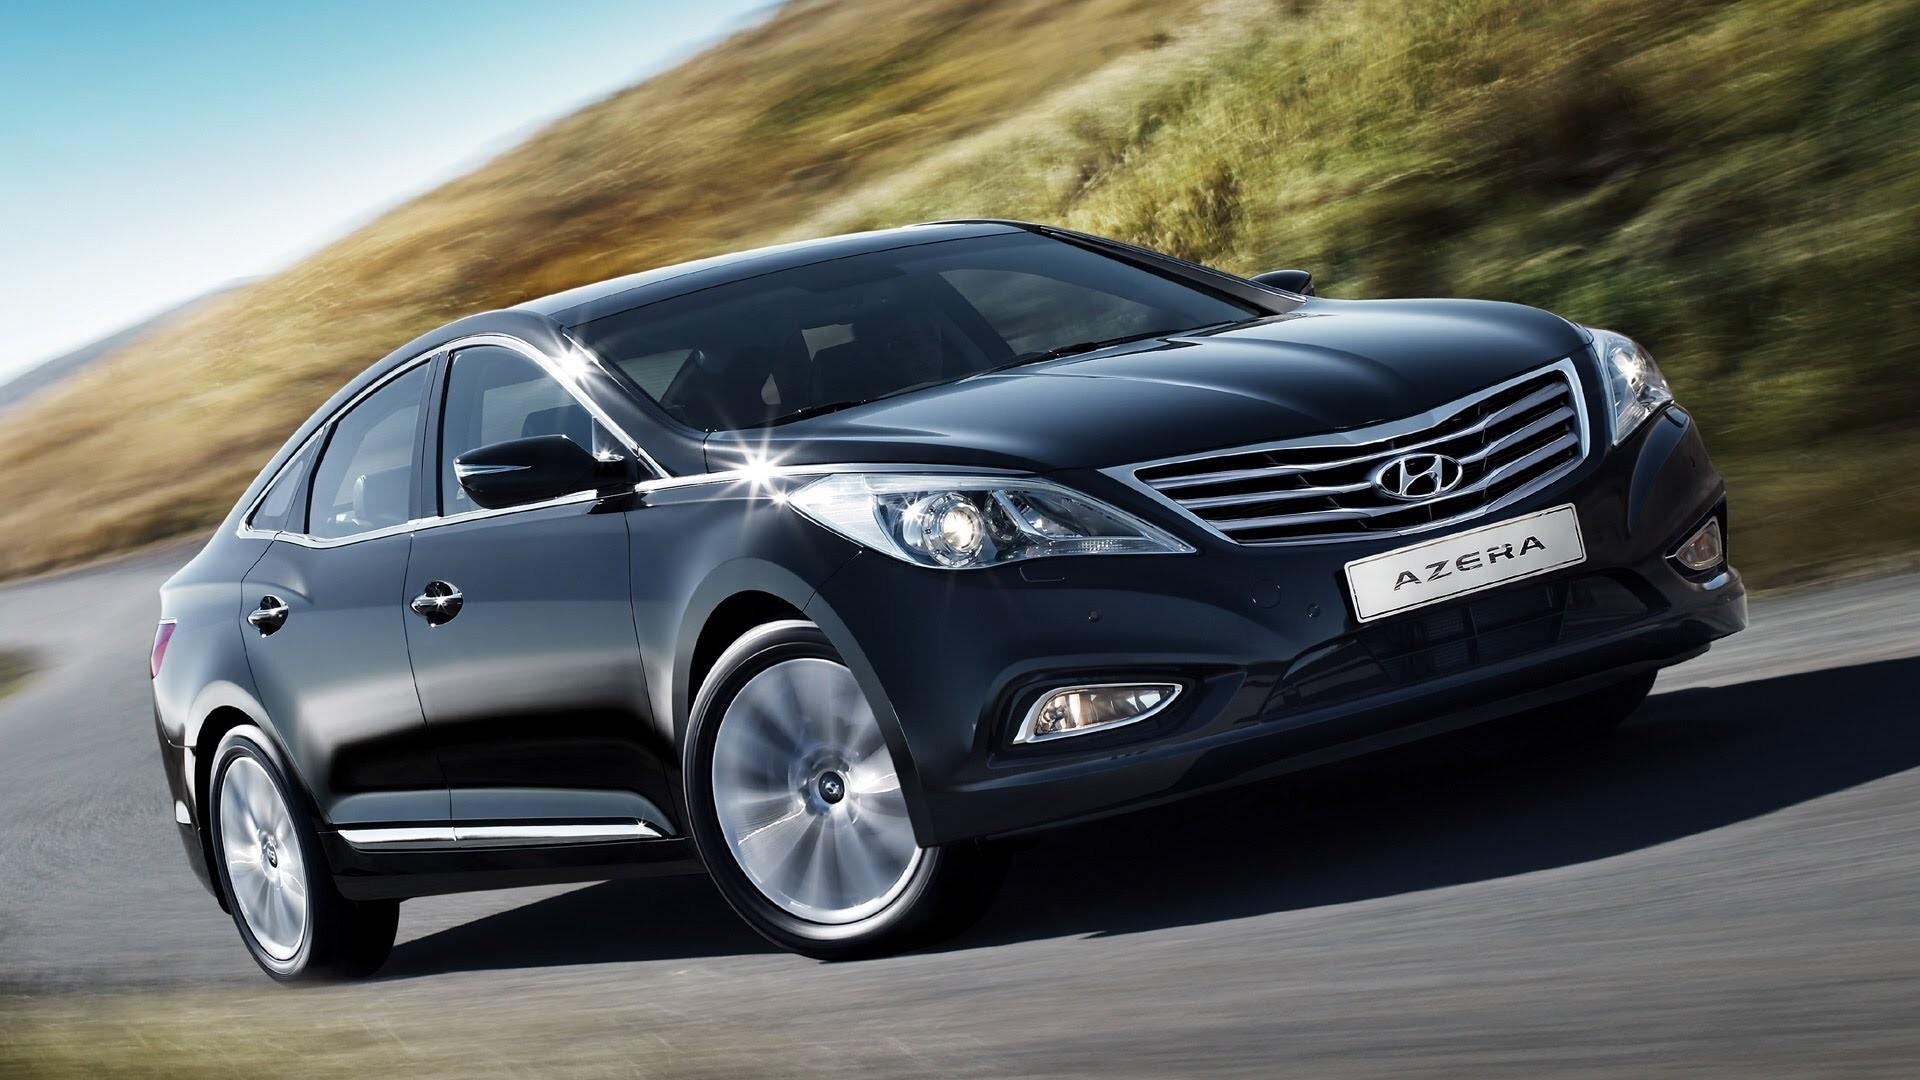 Hyundai Cars Wallpapers  Free Download HD New Latest Motors Images